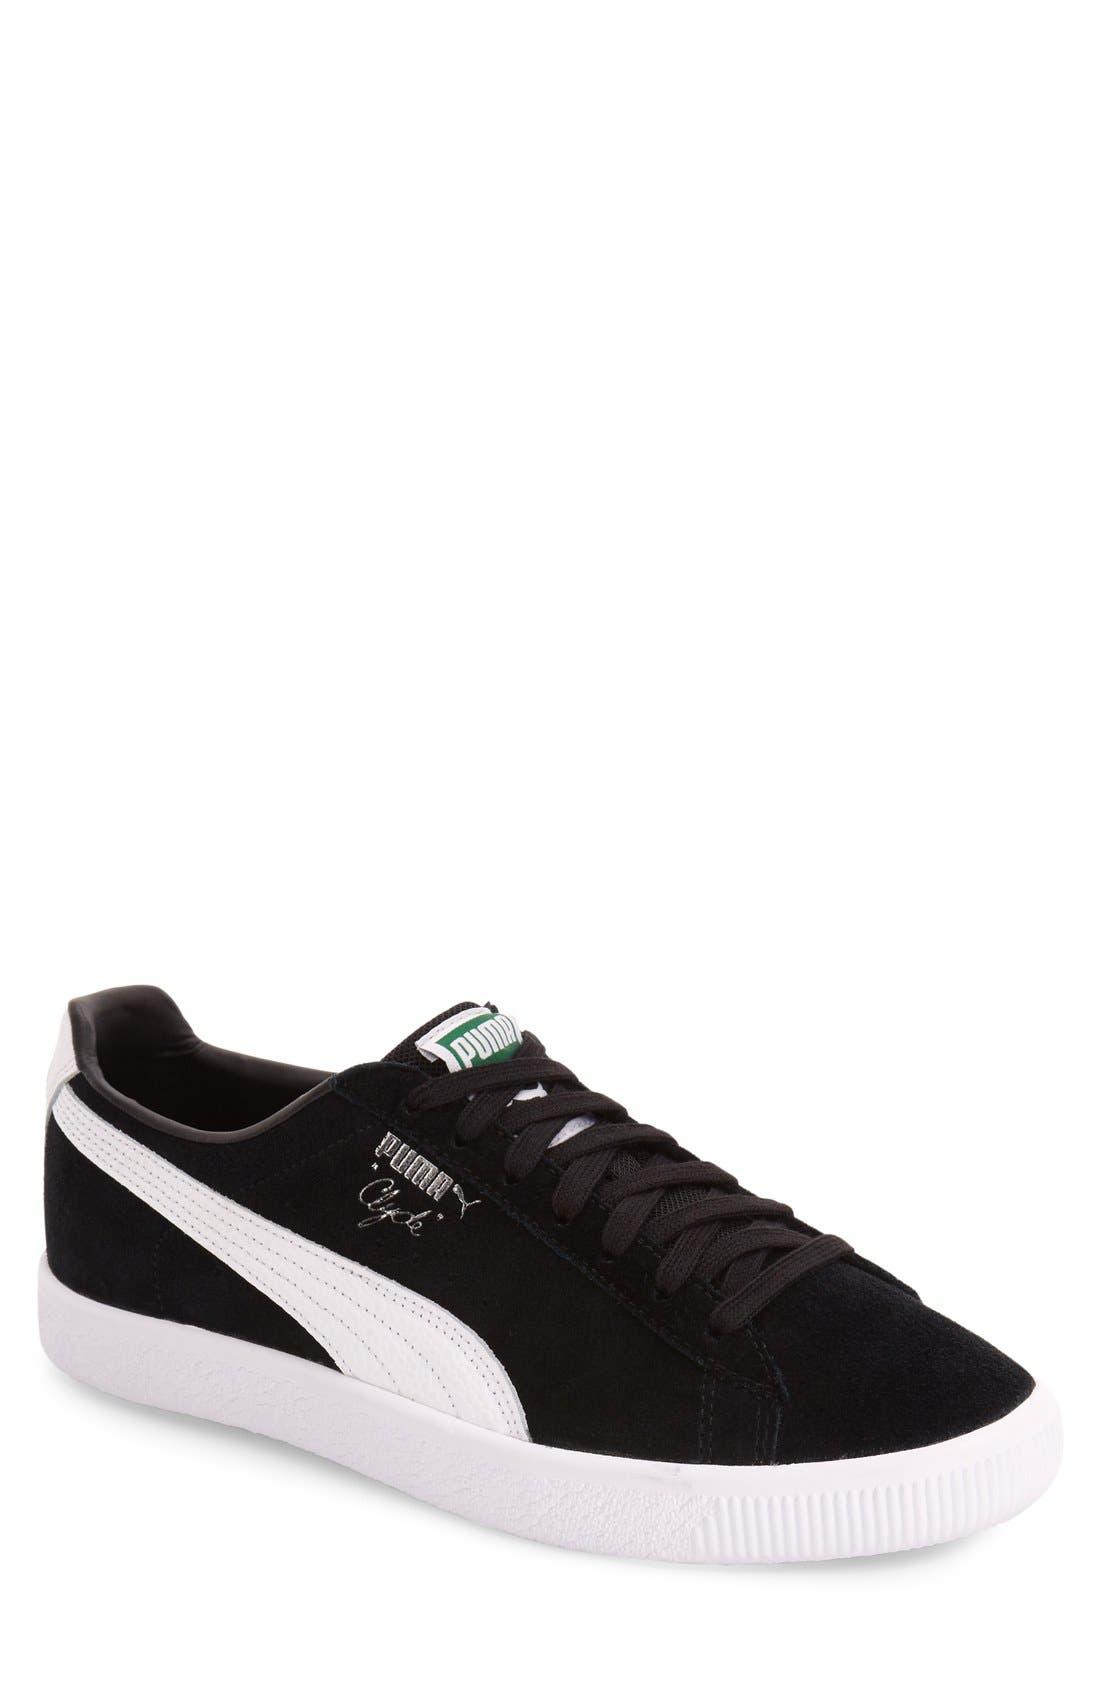 'Clyde B&C' Sneaker,                             Main thumbnail 1, color,                             001